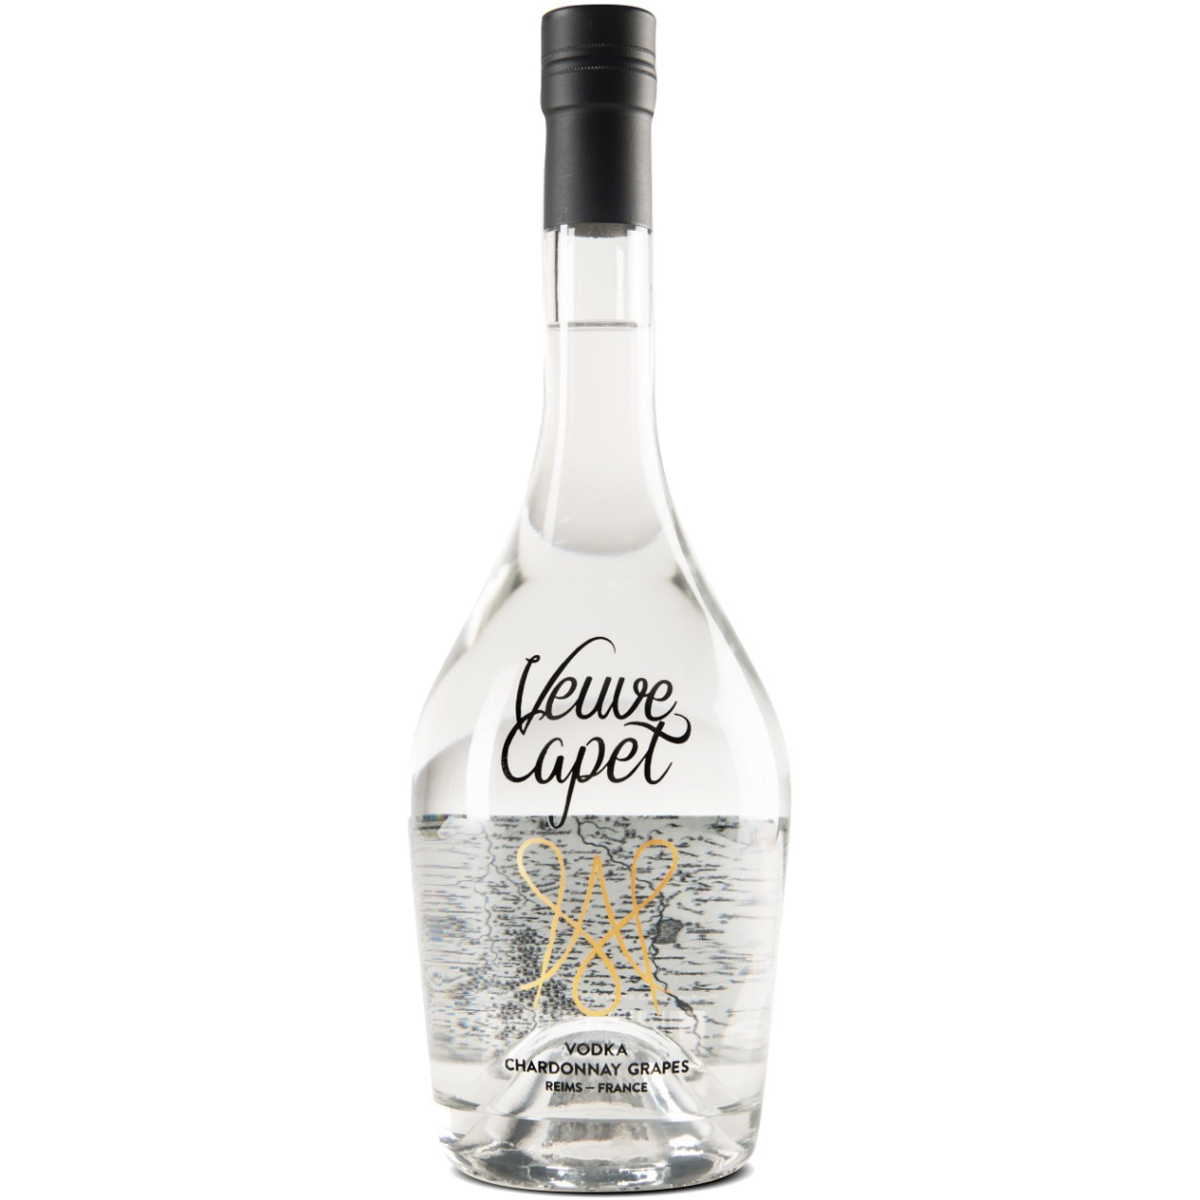 Veuve Capet Chardonnay Vodka 38%